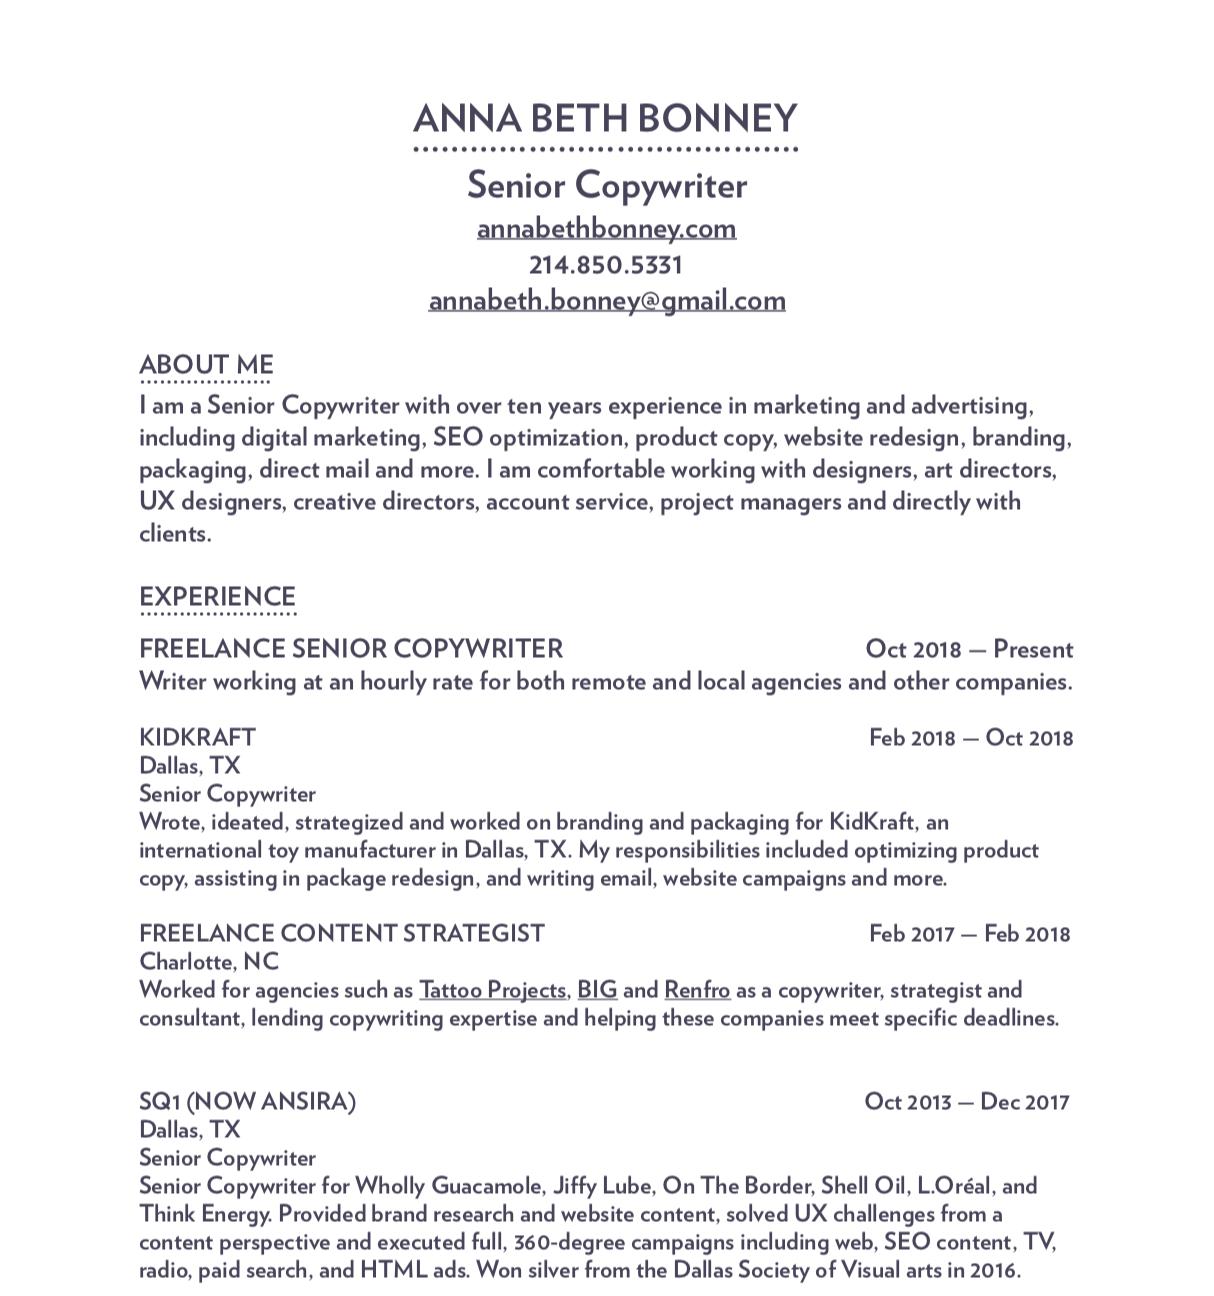 The Resume Anna Beth Bonney